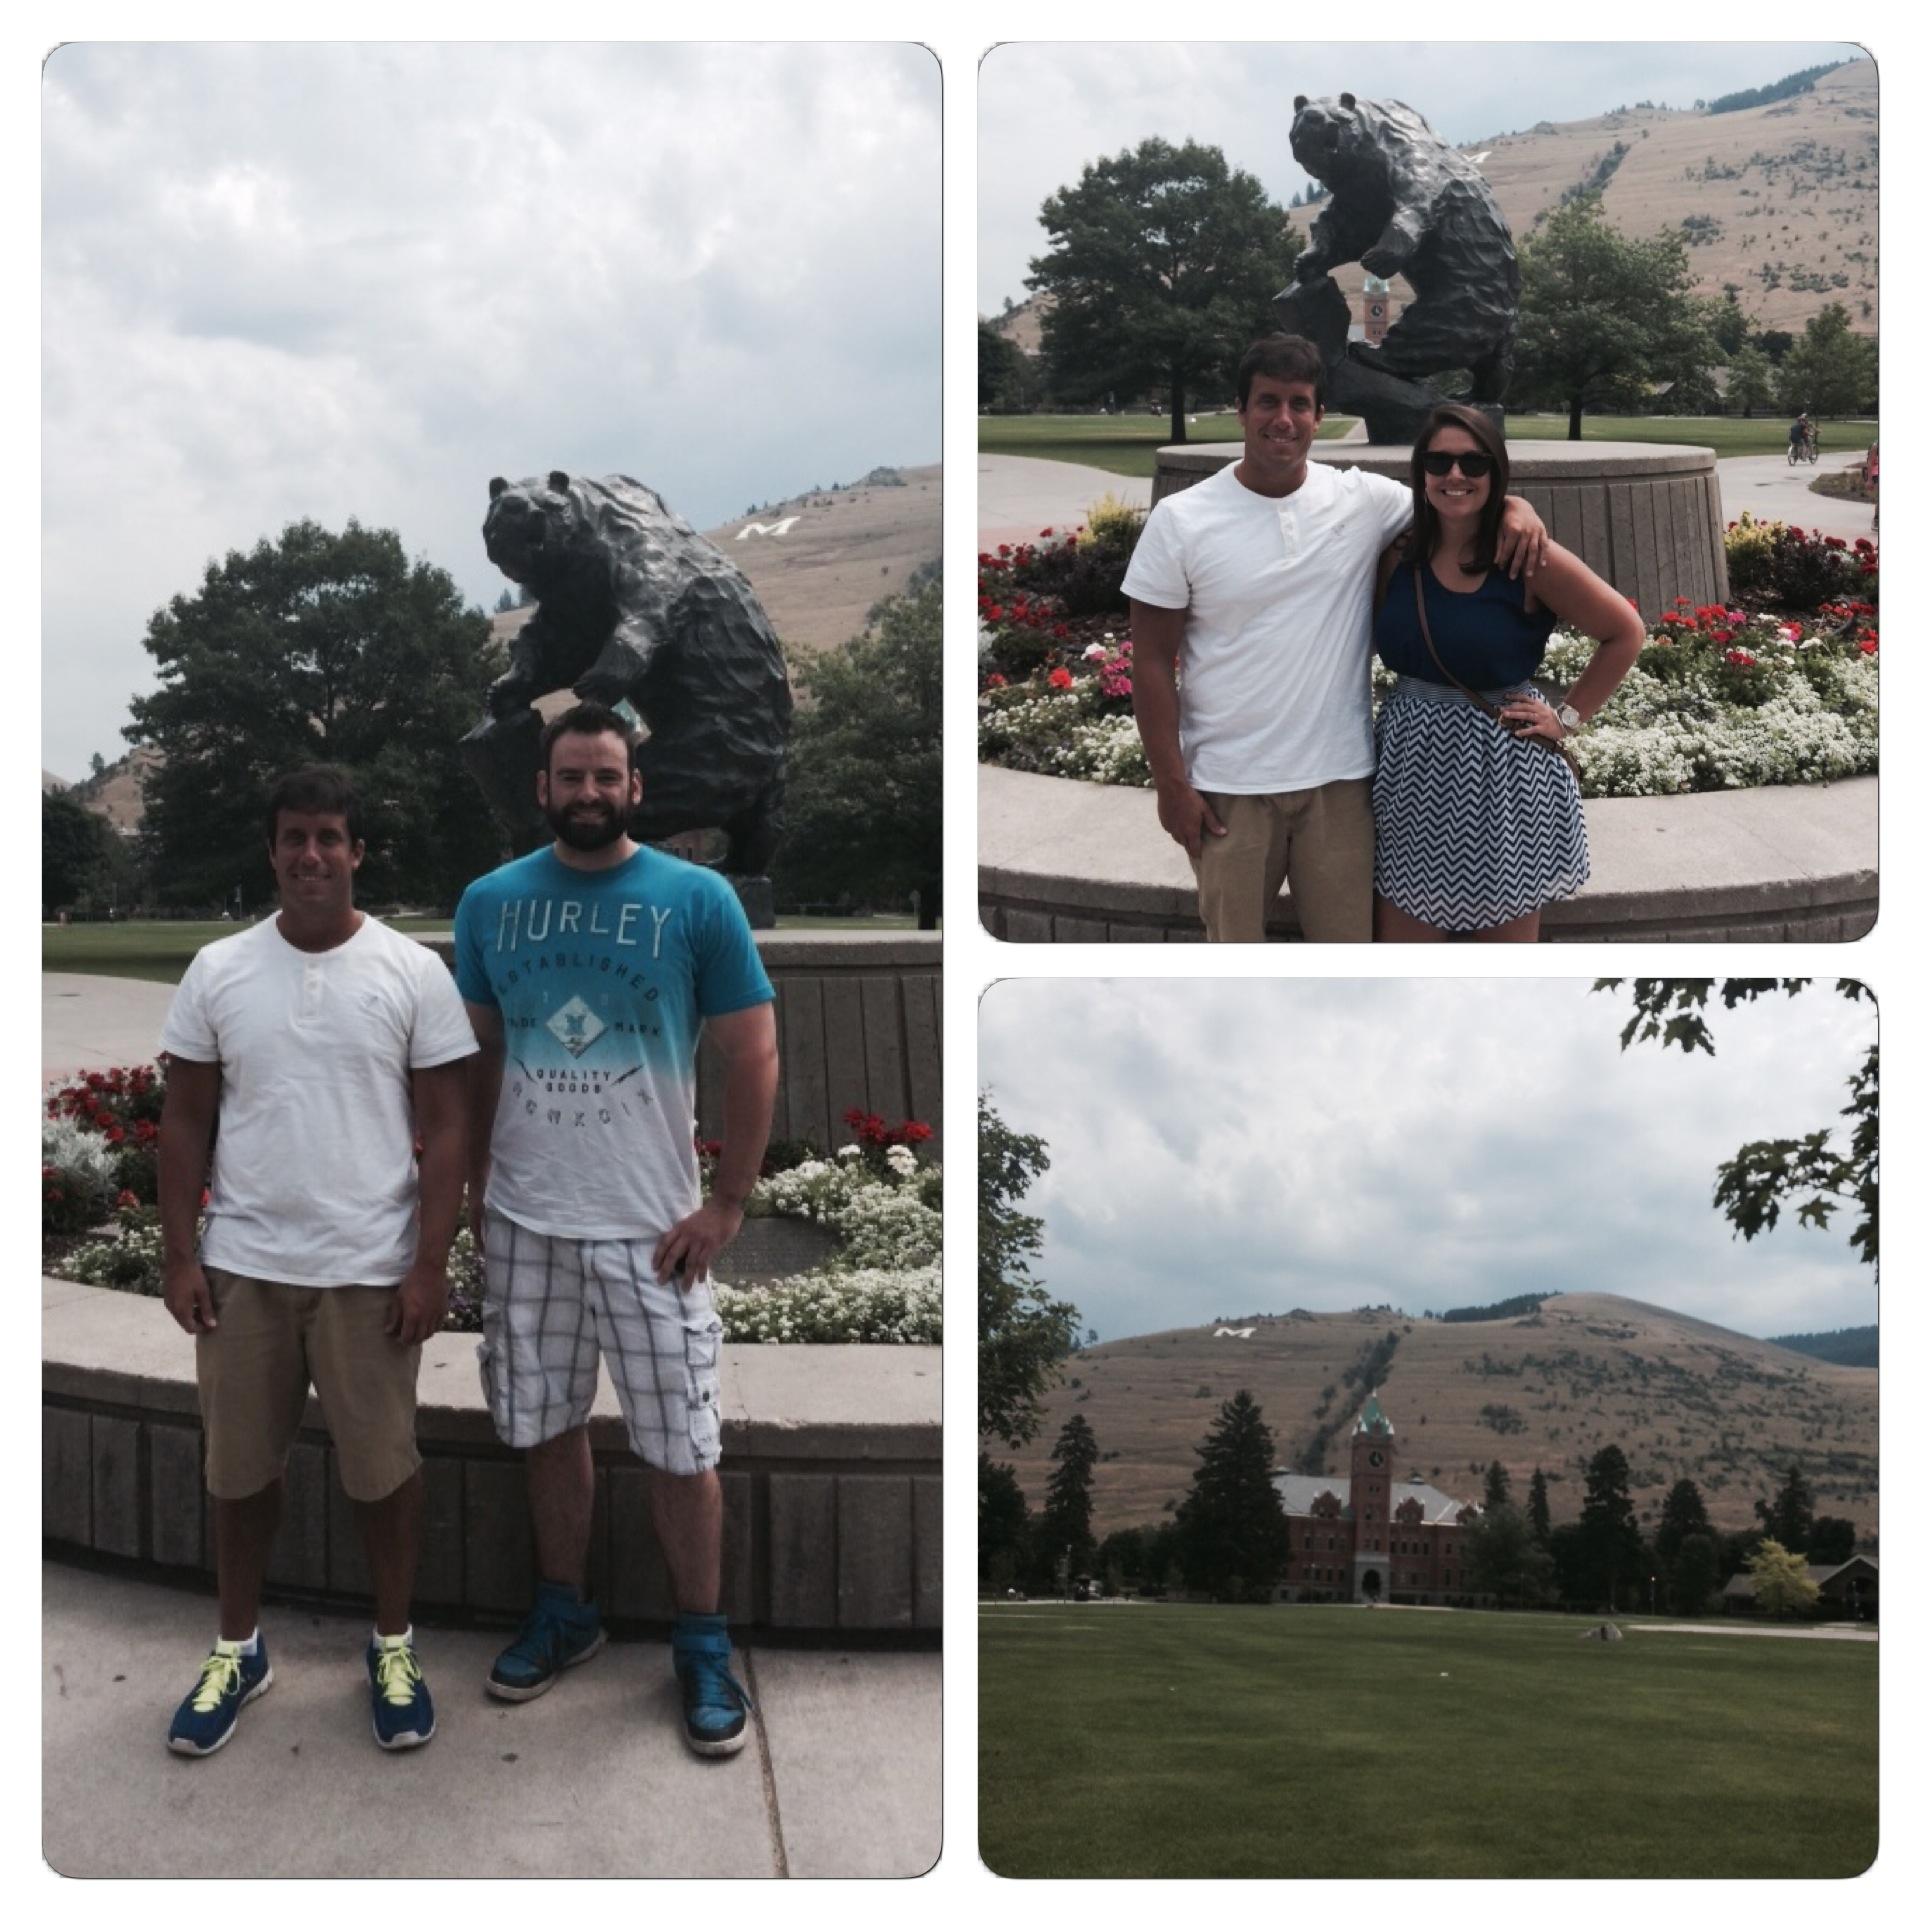 We enjoyed walking around the beautiful University of Montana campus.